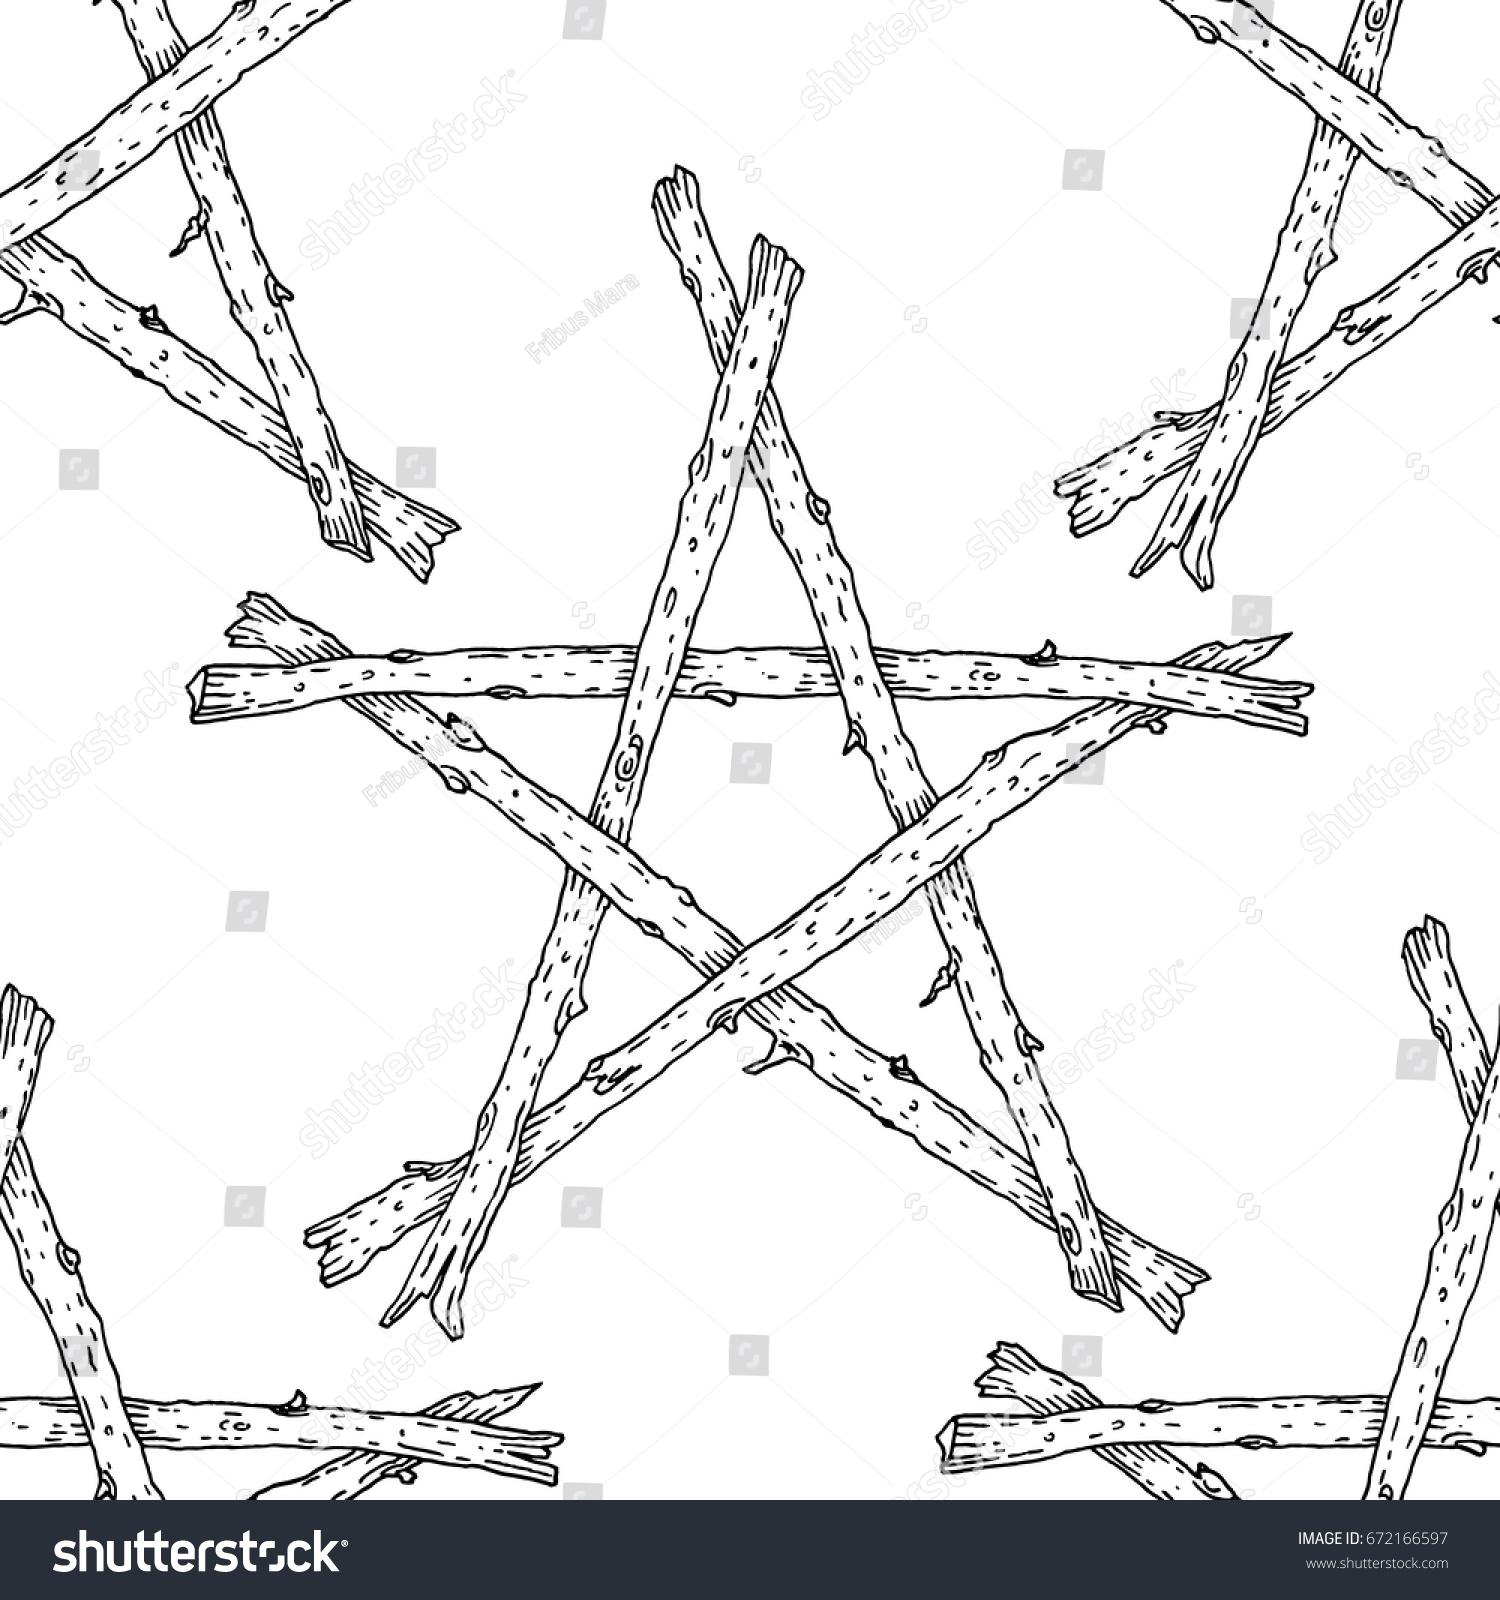 Witchcraft wicca sticks pentagram seamless pattern stock vector witchcraft wicca sticks pentagram seamless pattern hand drawn magic occult star symbol vector background buycottarizona Choice Image